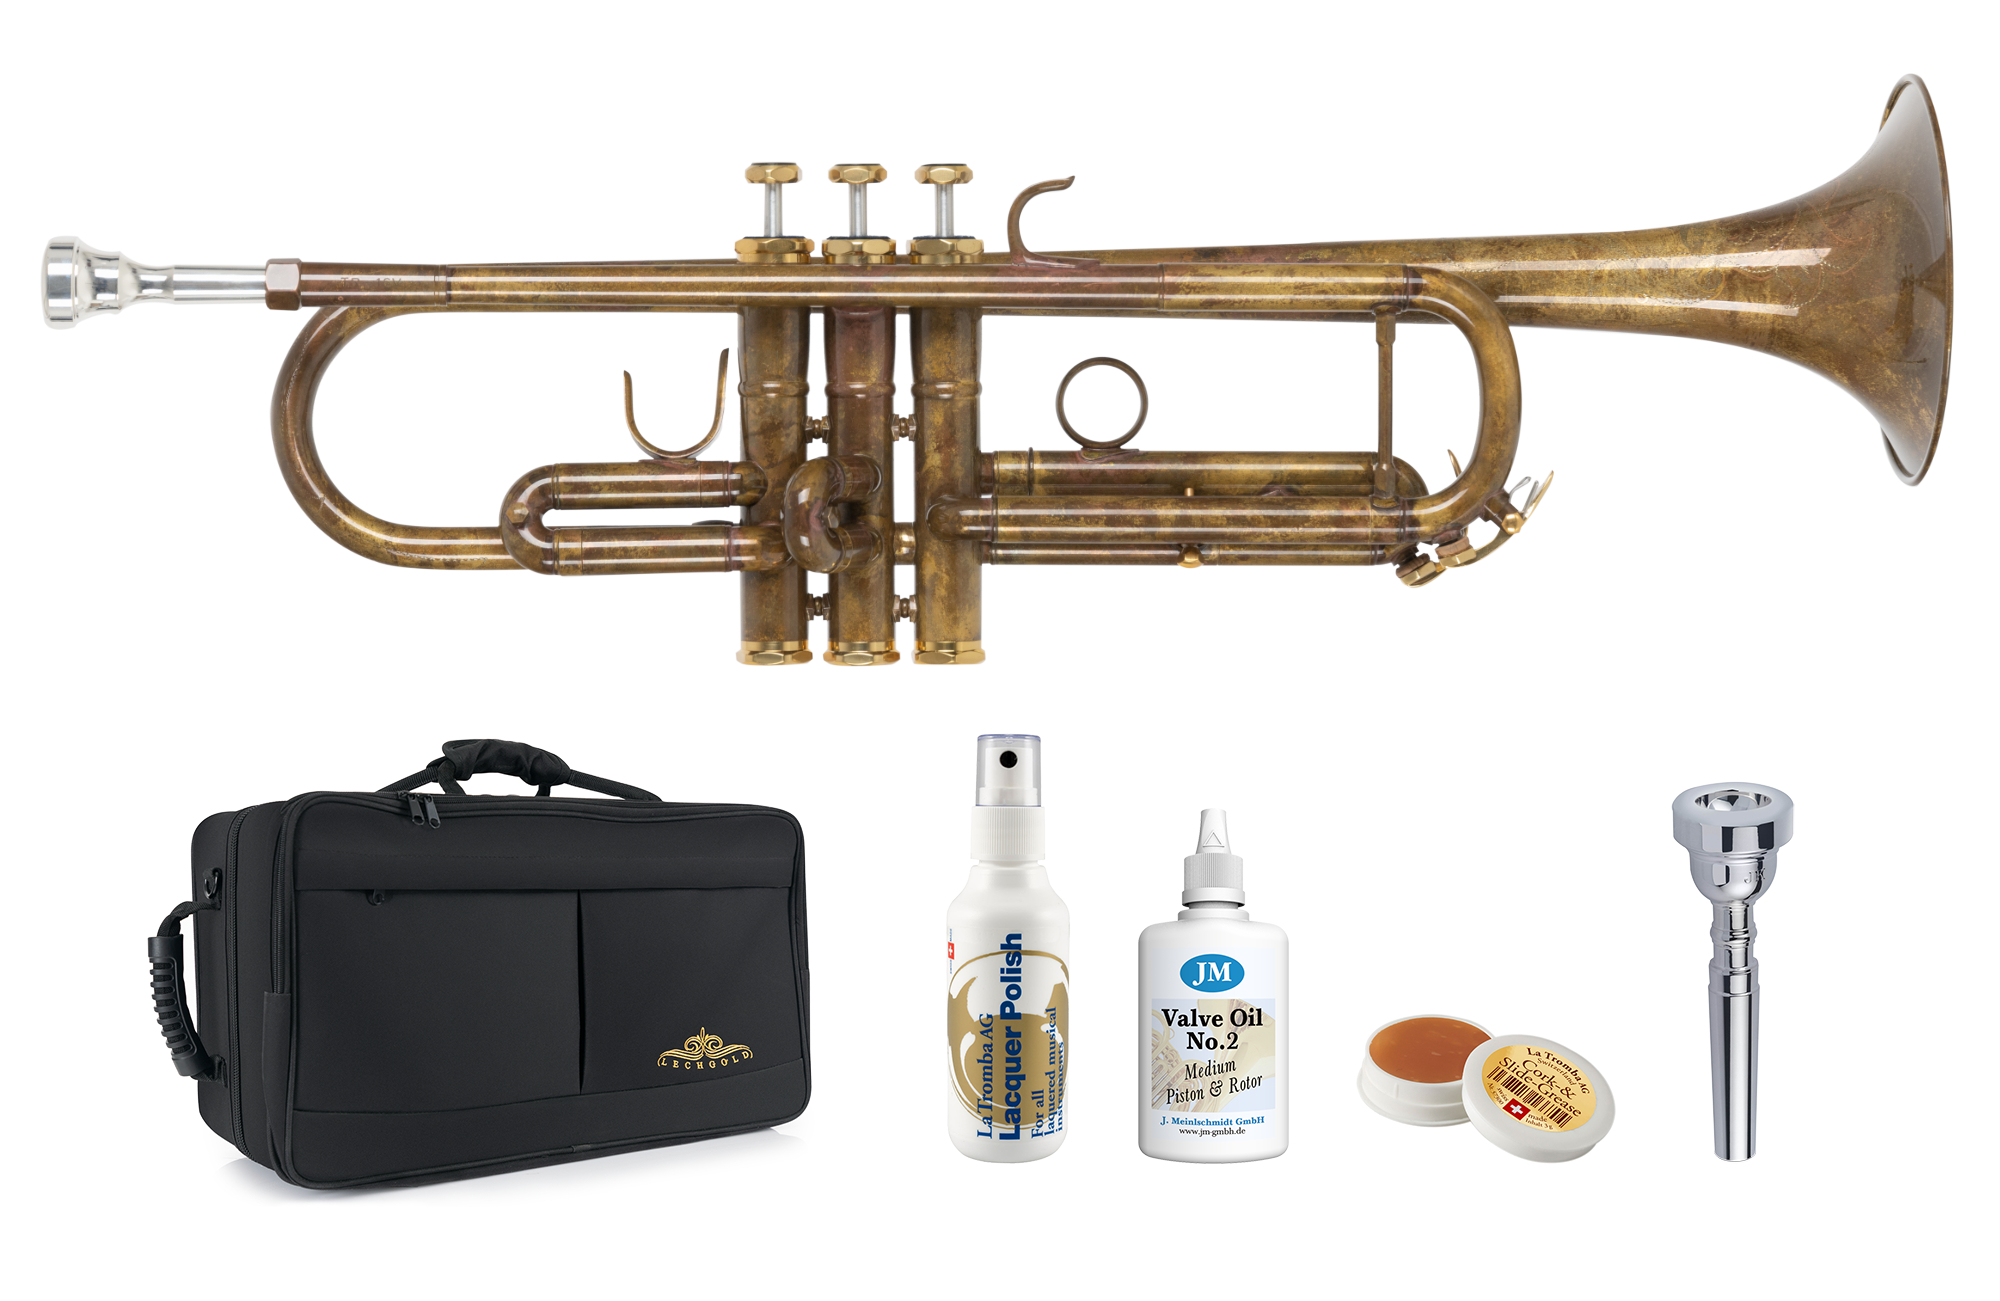 Trompeten - Lechgold TR 16V Bb Trompete antik Deluxe Set - Onlineshop Musikhaus Kirstein